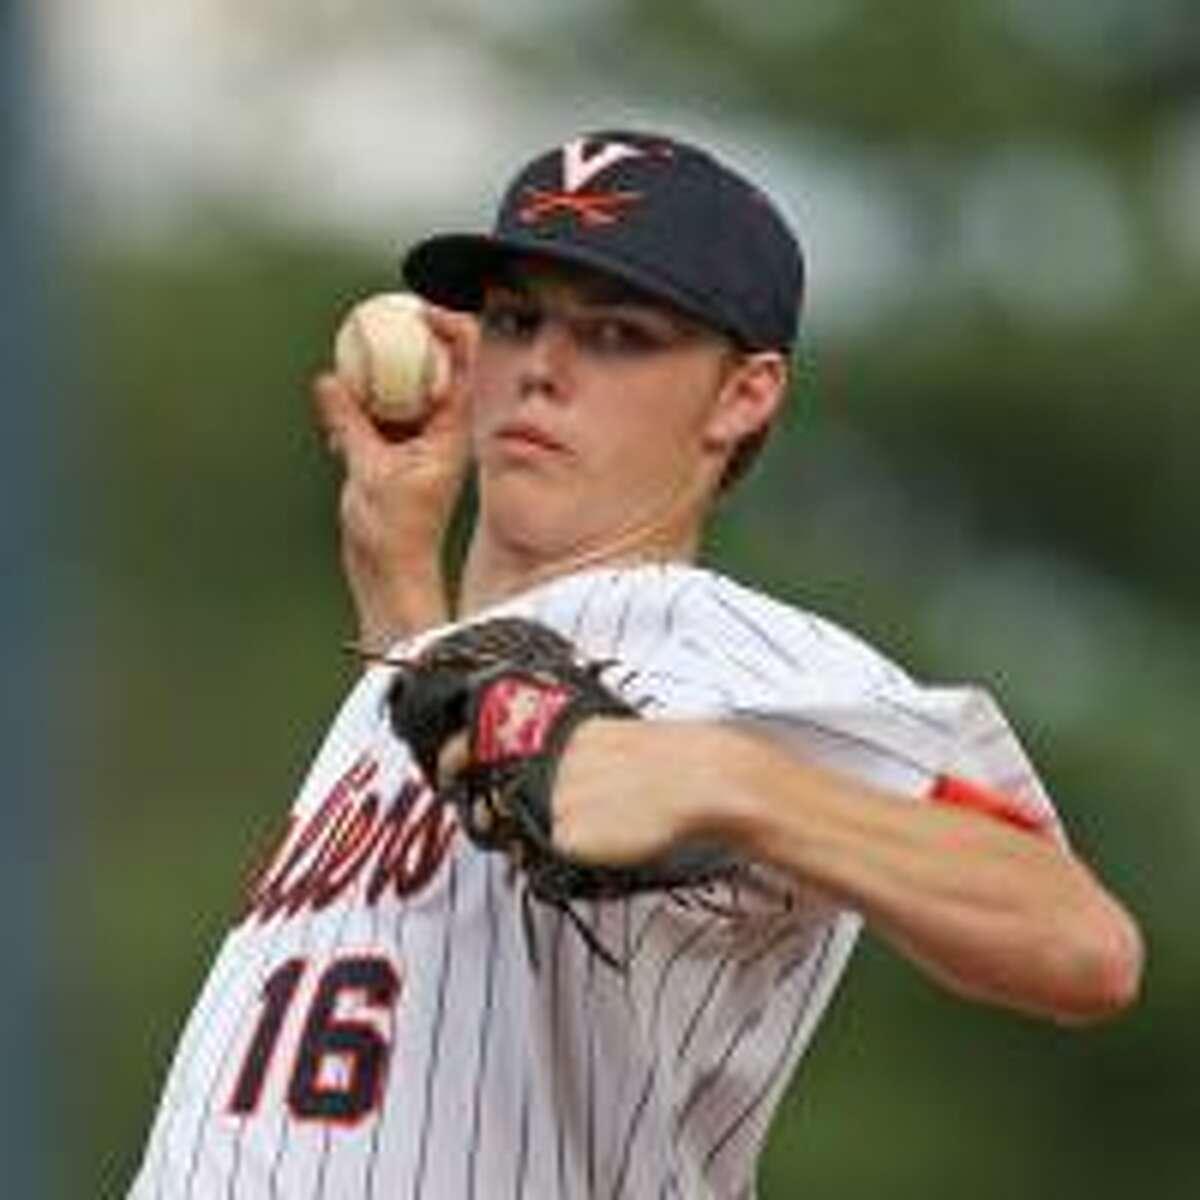 Ex-Wilton baseball player Jake Cowan done for the season